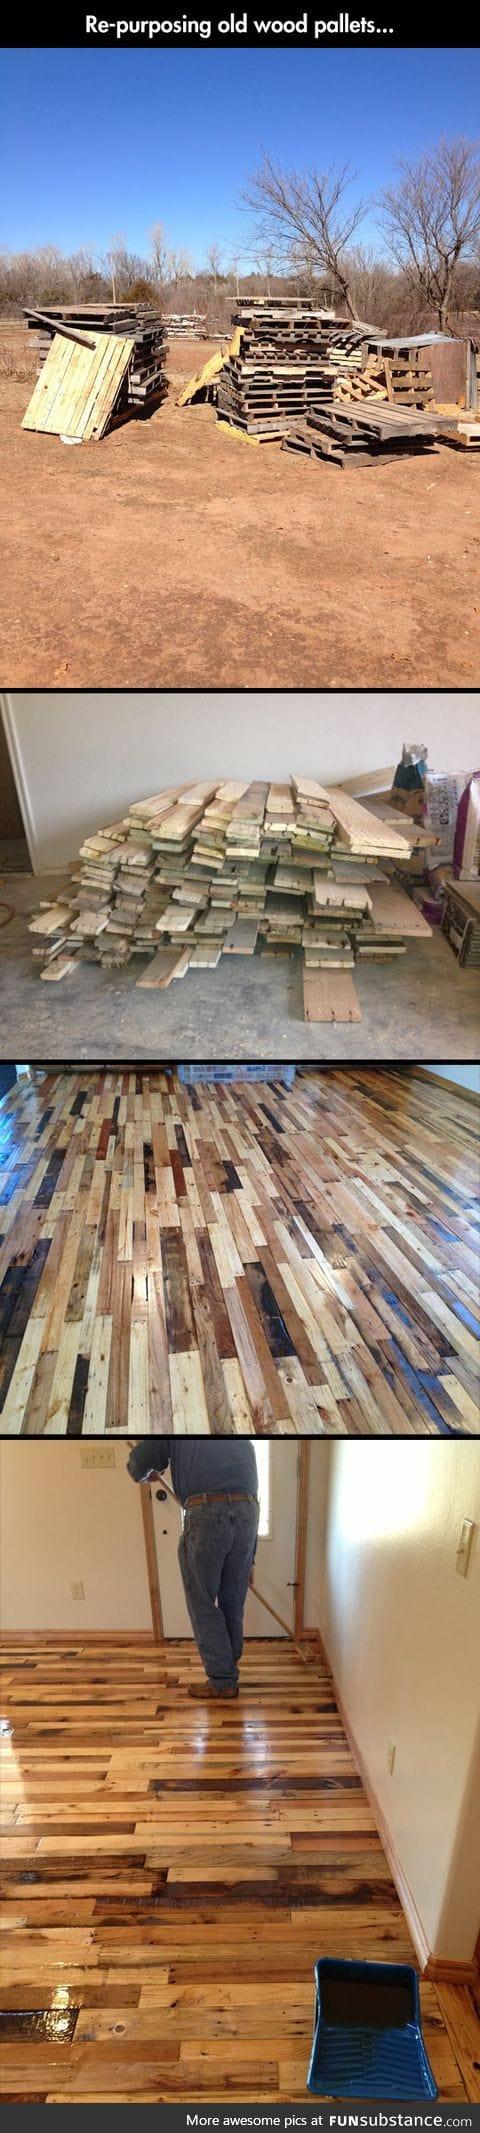 Old woods pallets